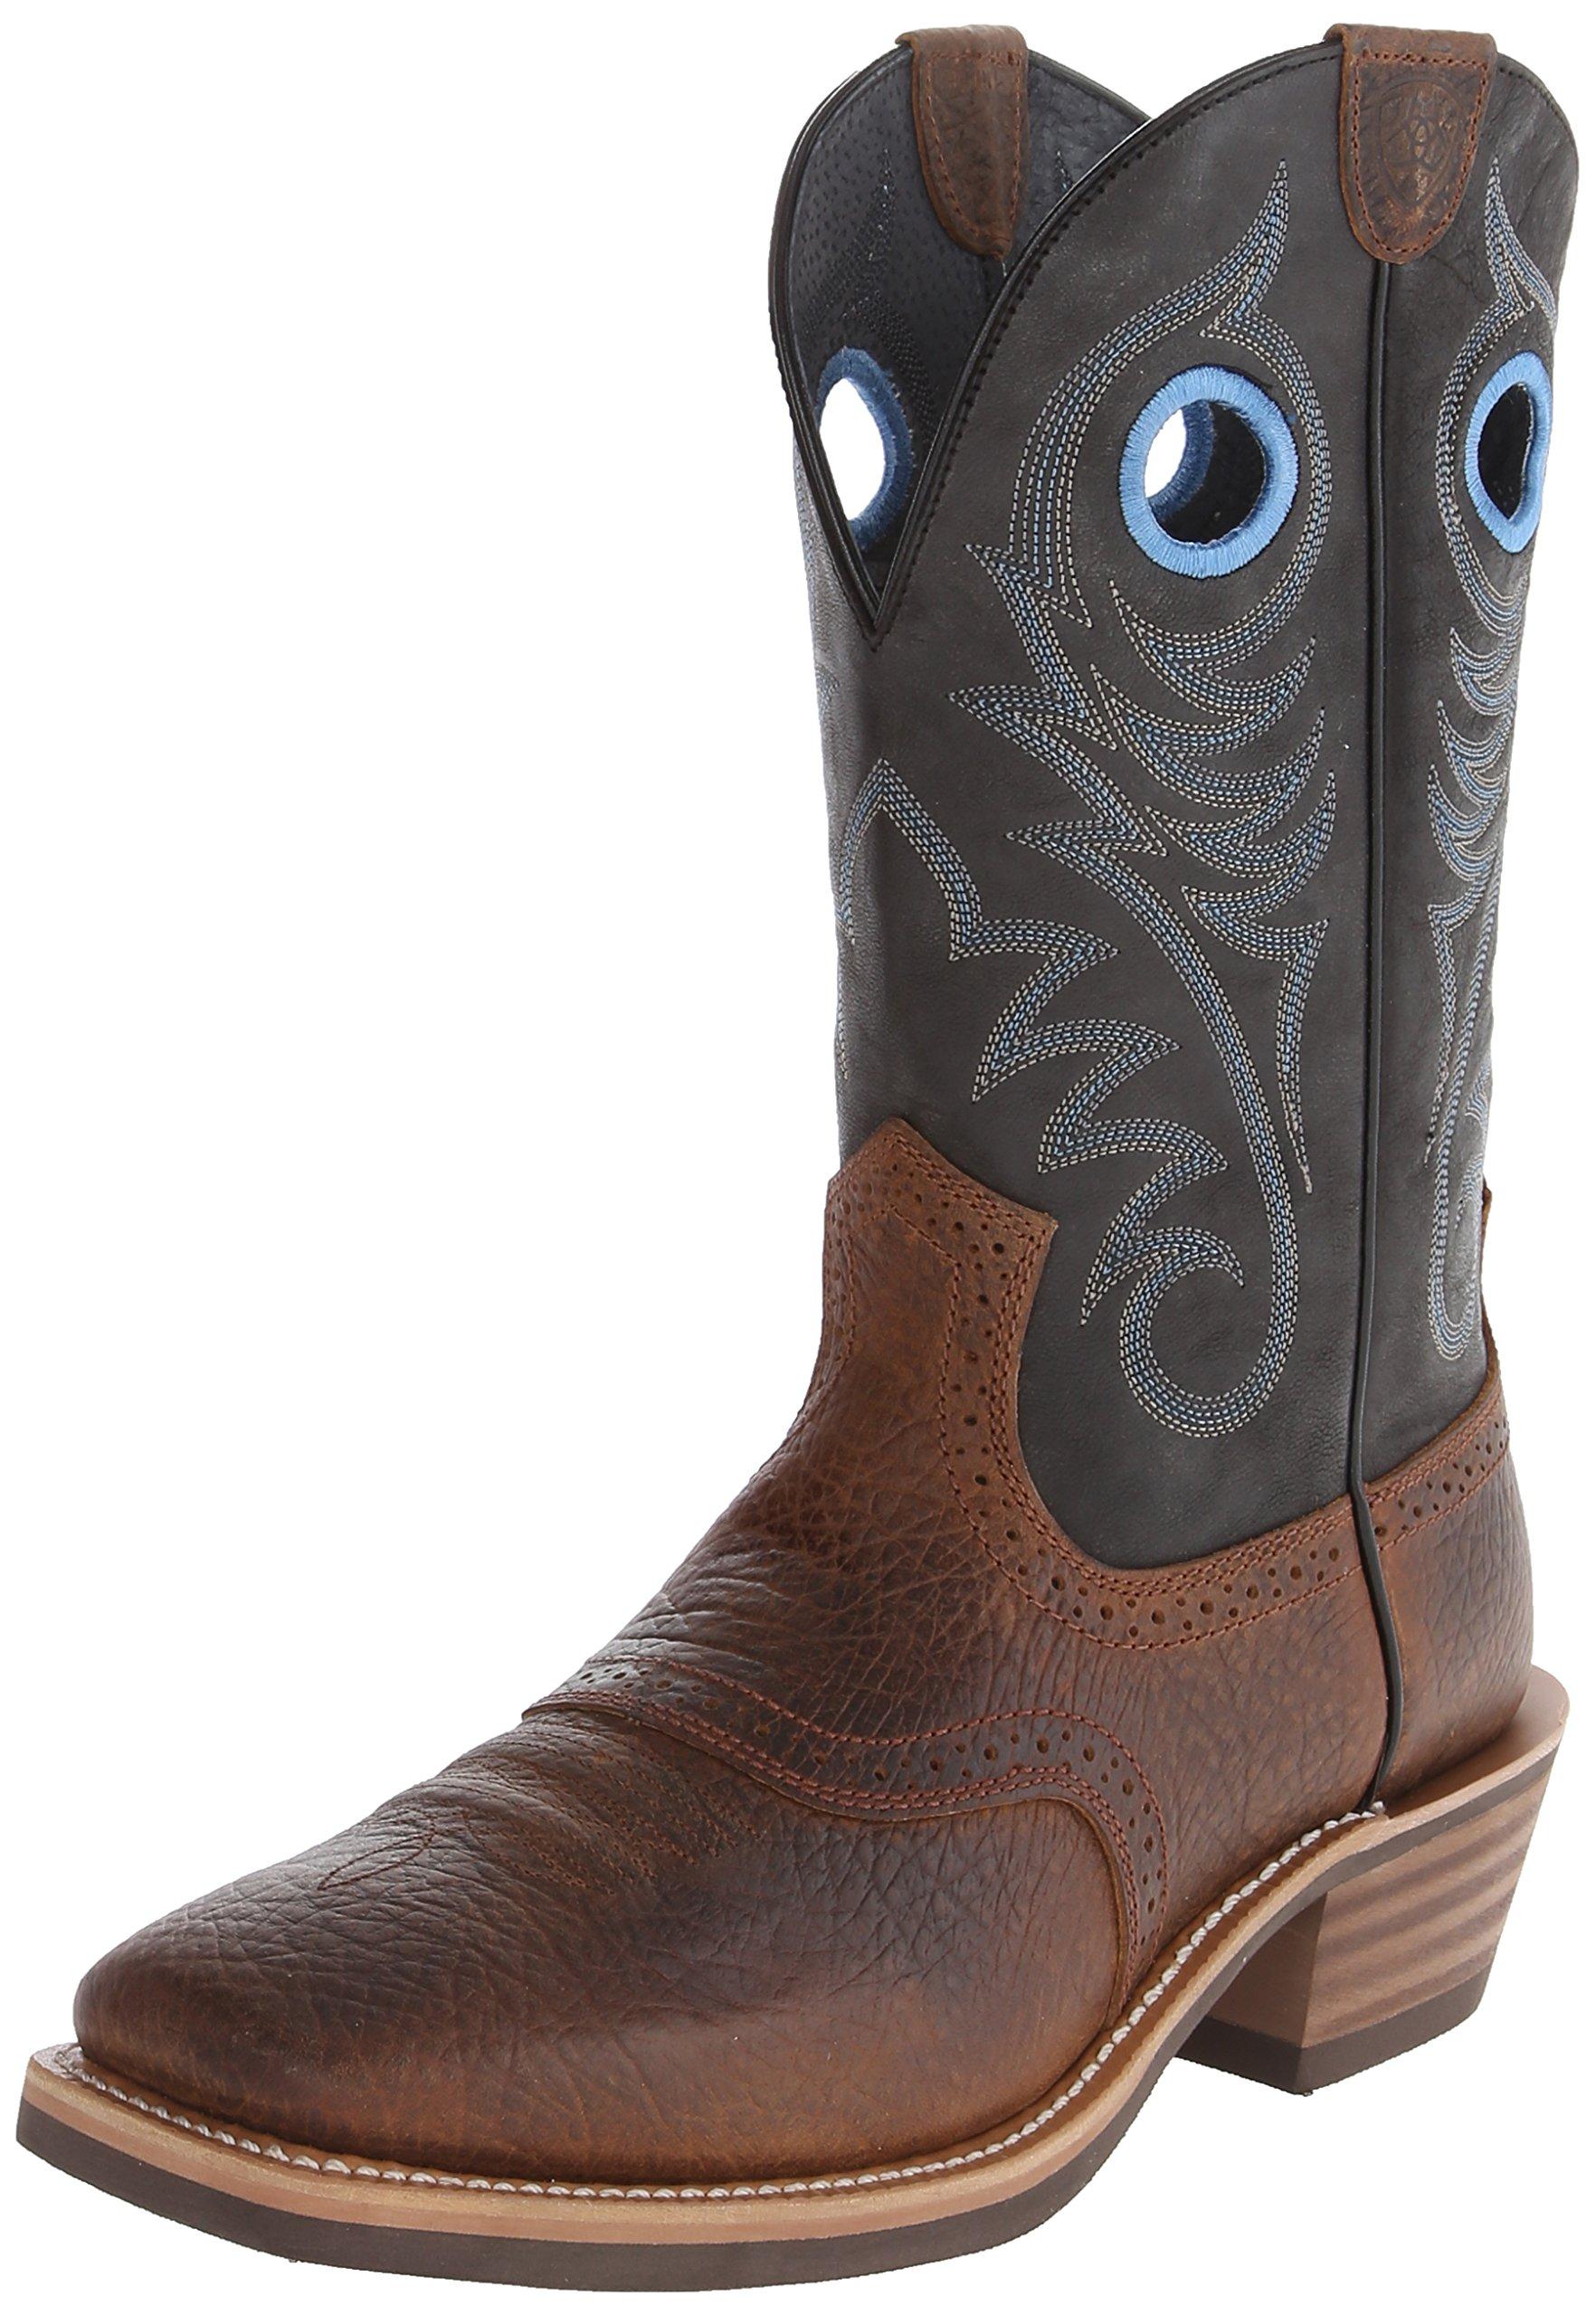 Ariat Men's Heritage Roughstock Western Cowboy Boot, Earth/Vintage Black, 9.5 EE